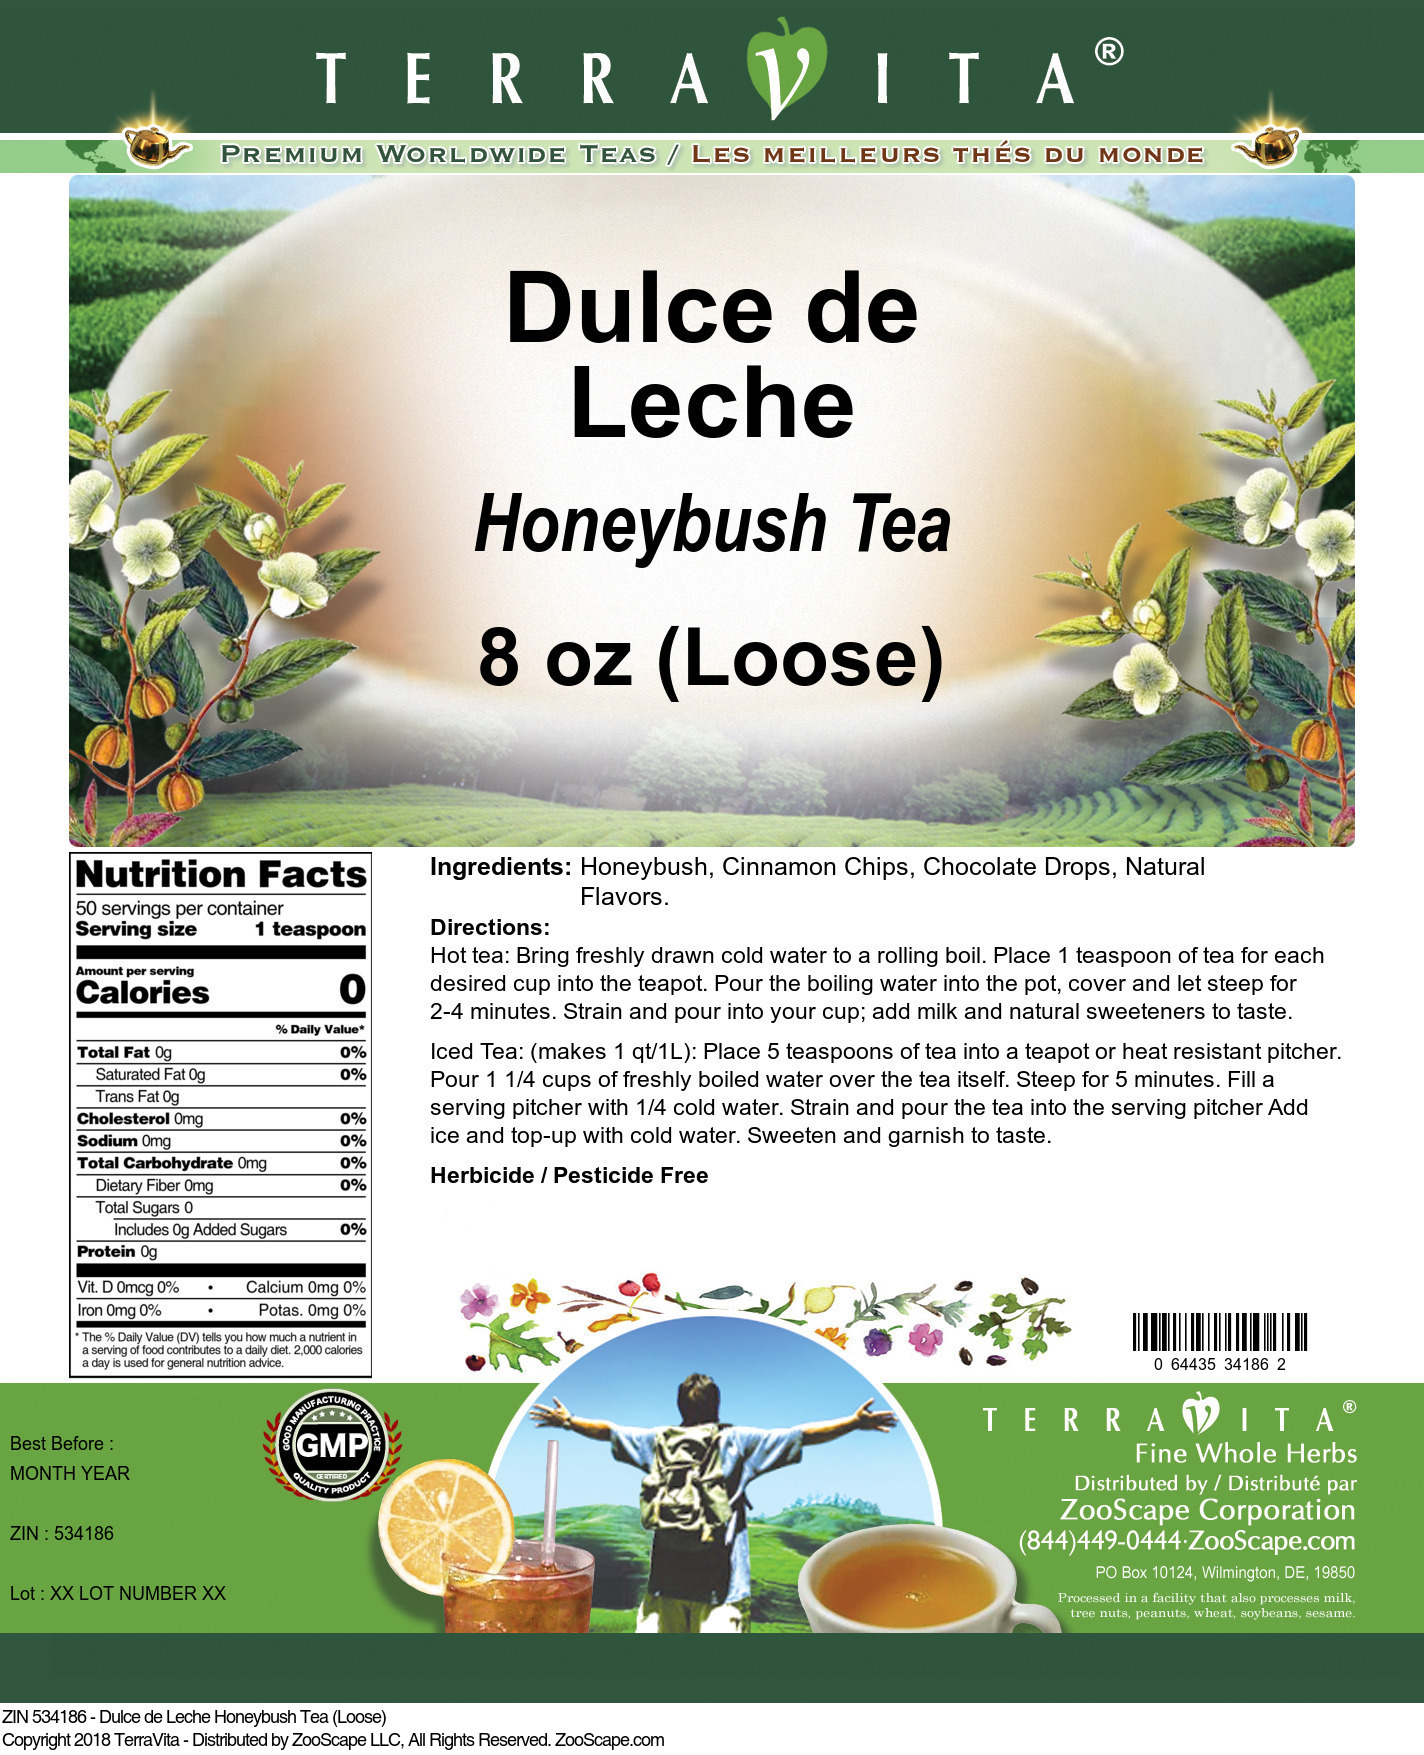 Dulce de Leche Honeybush Tea (Loose)